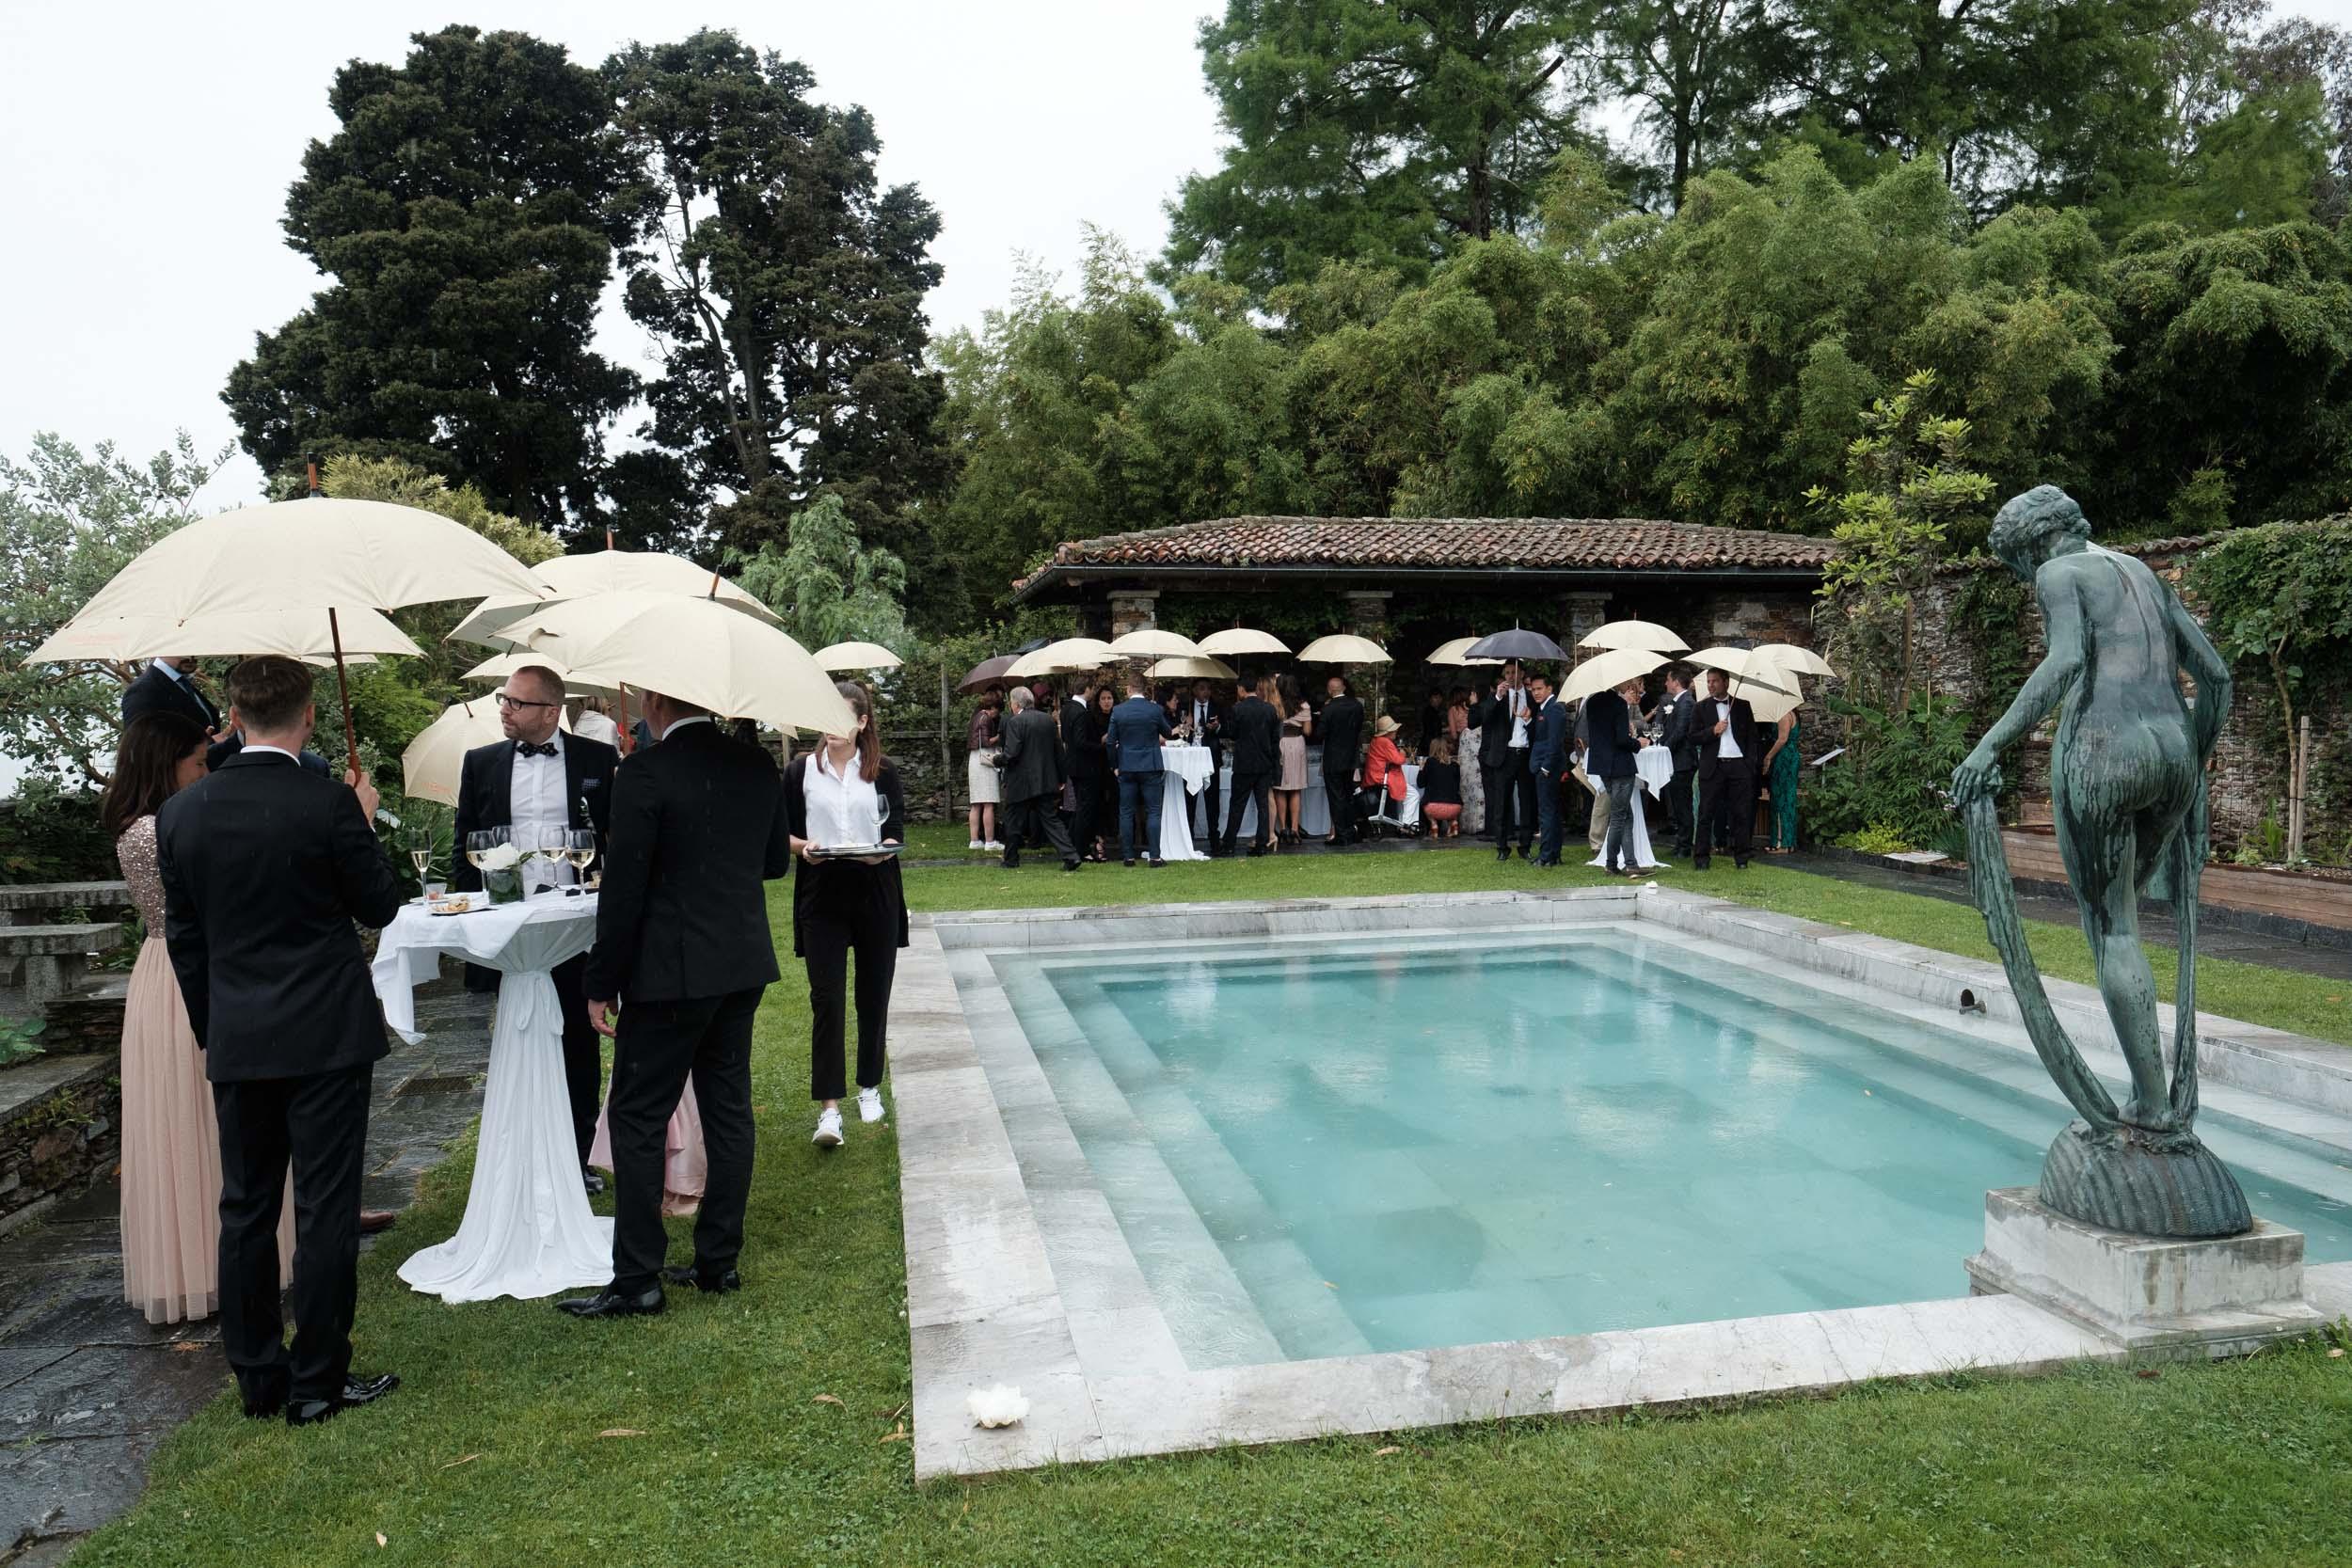 olivia-andreas-wedding-switzerland-231.jpg